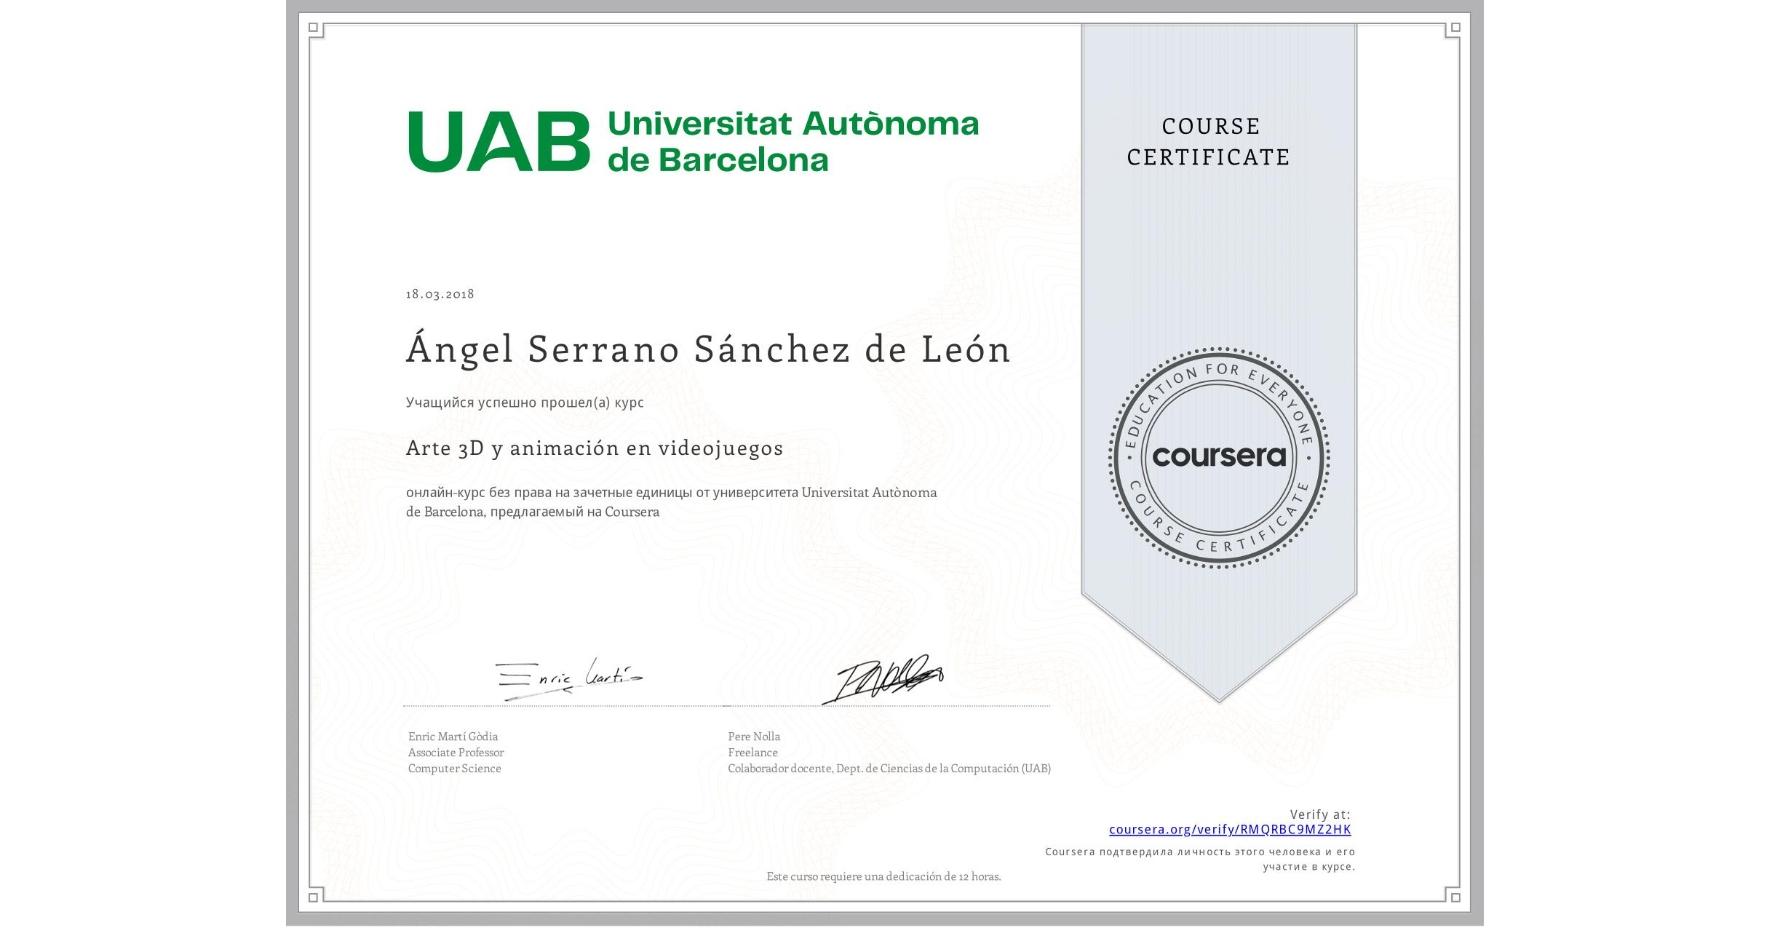 View certificate for Ángel Serrano Sánchez de León, Arte 3D y animación en videojuegos, an online non-credit course authorized by Universitat Autònoma de Barcelona and offered through Coursera